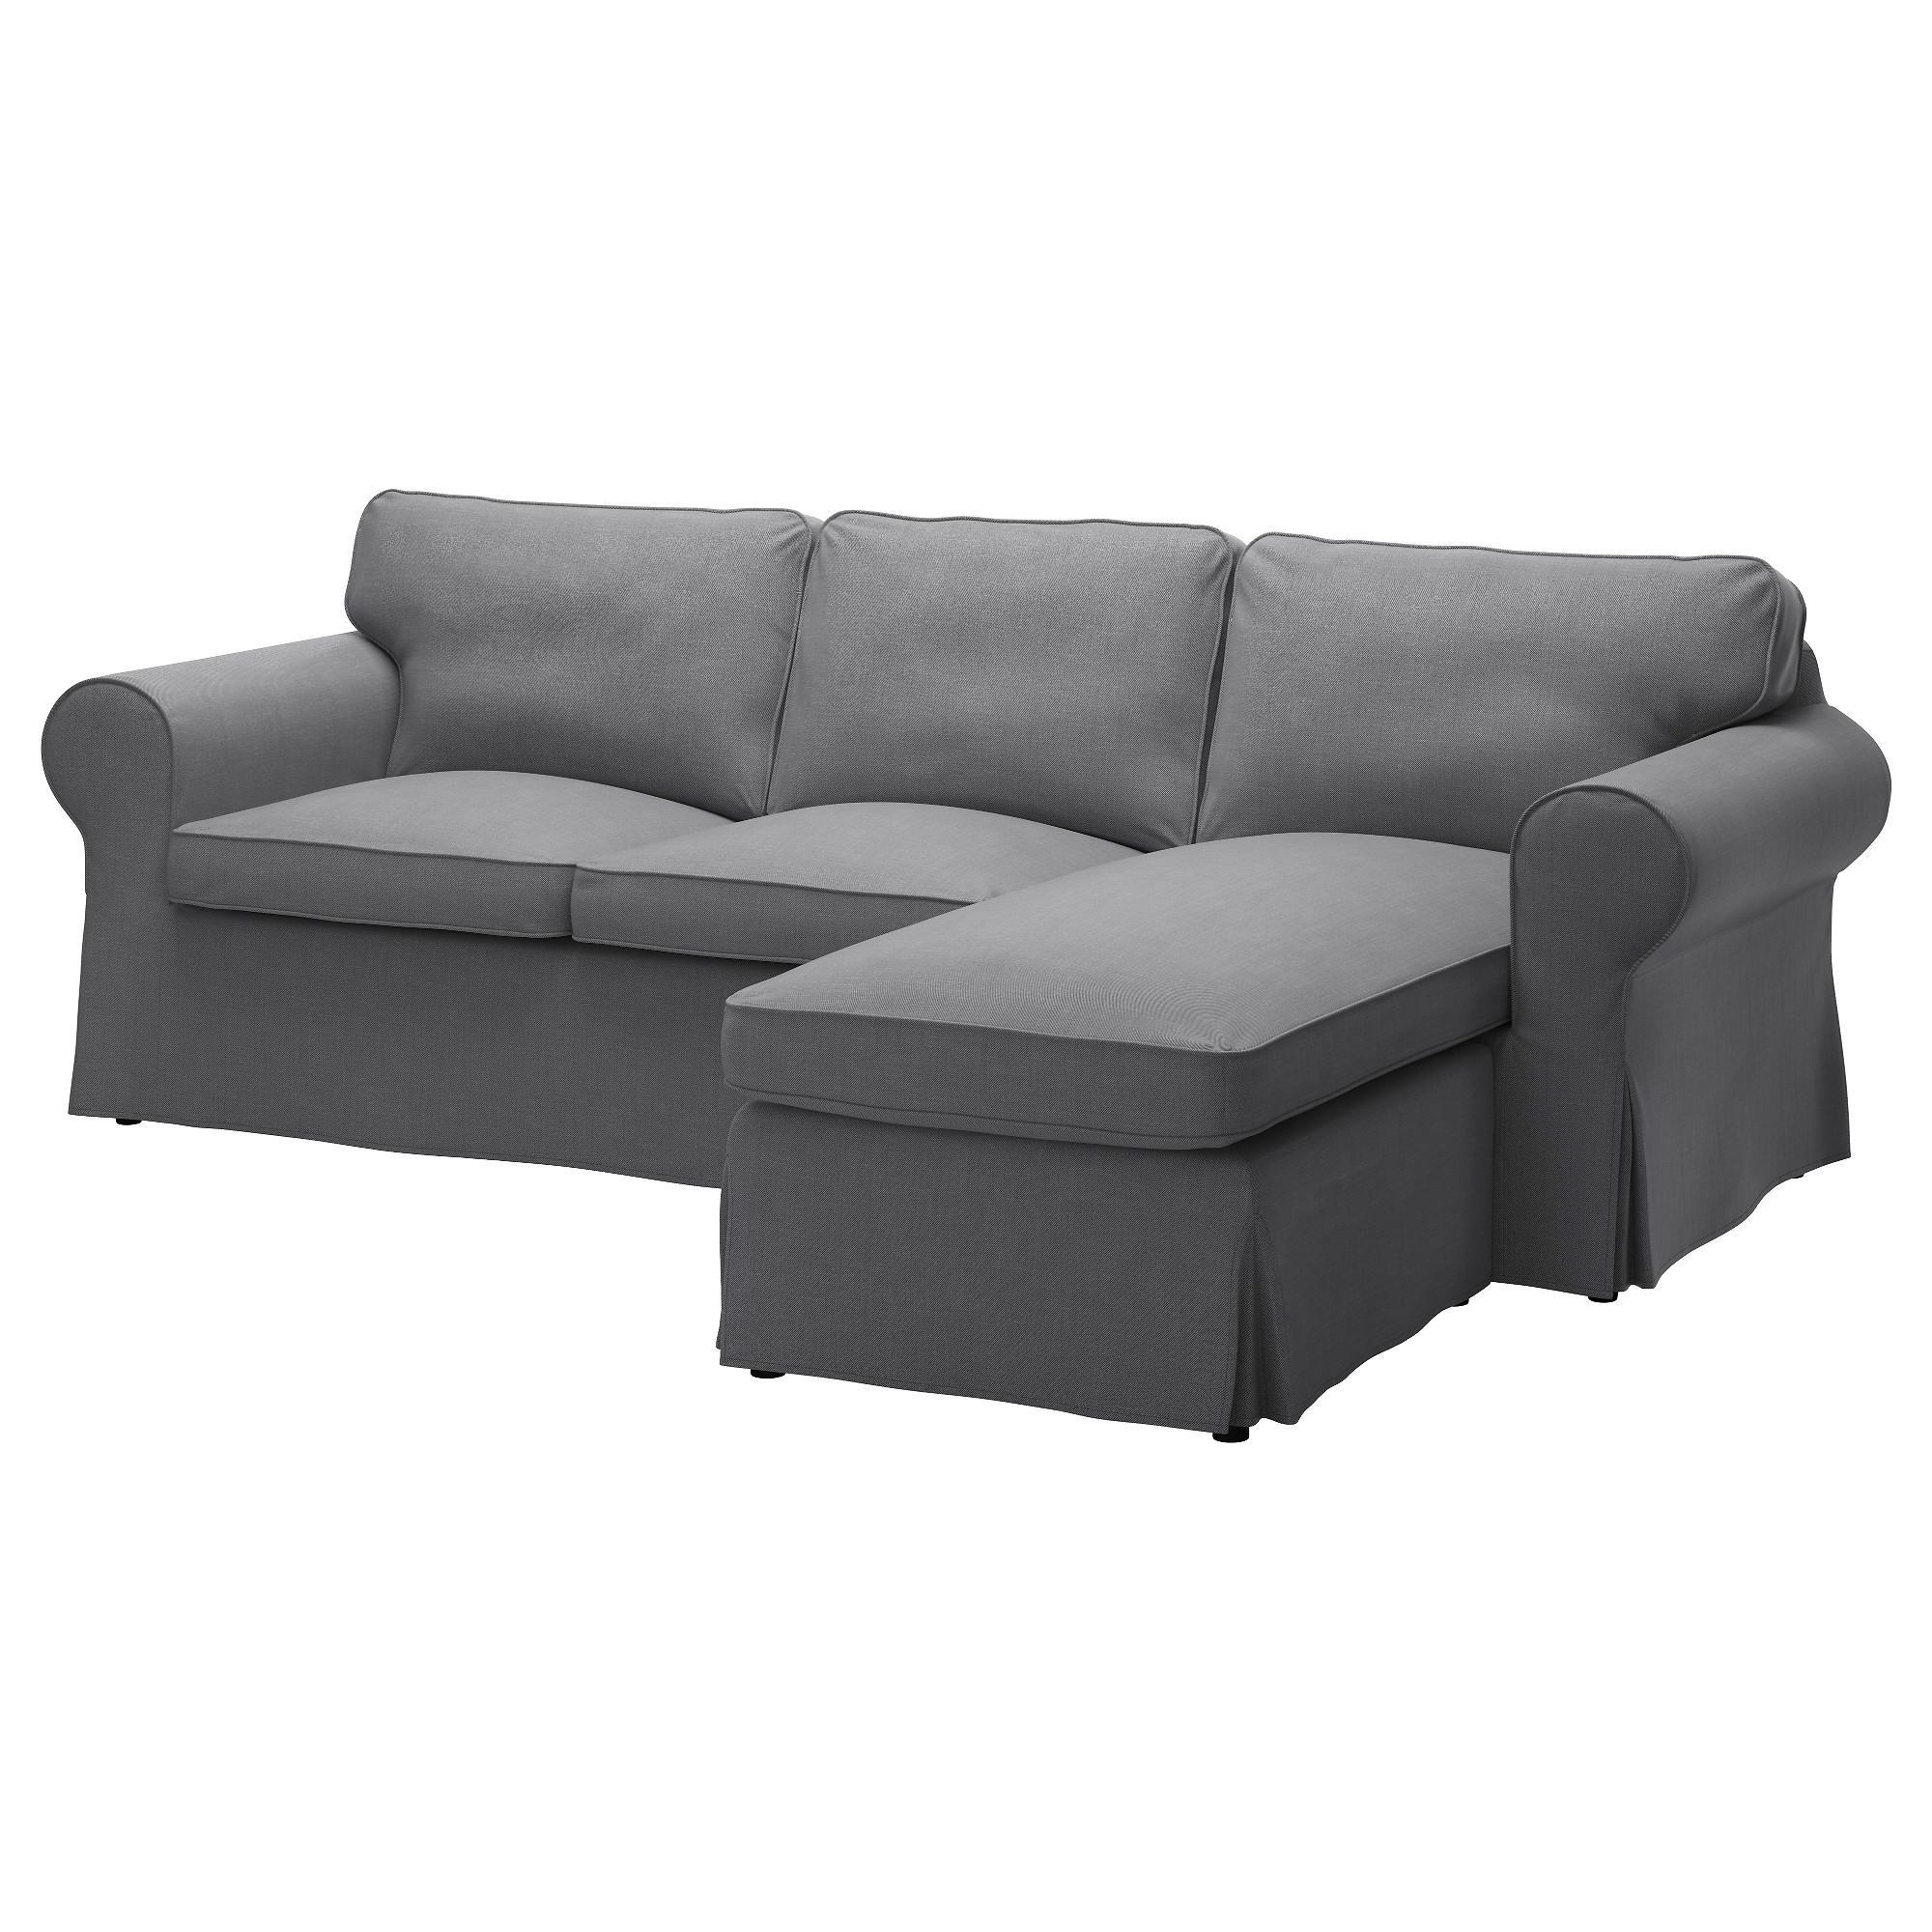 Ektorp 3-Seat Sofa With Chaise Longue/nordvalla Dark Grey - Ikea throughout Ikea Chaise Lounge Sofa